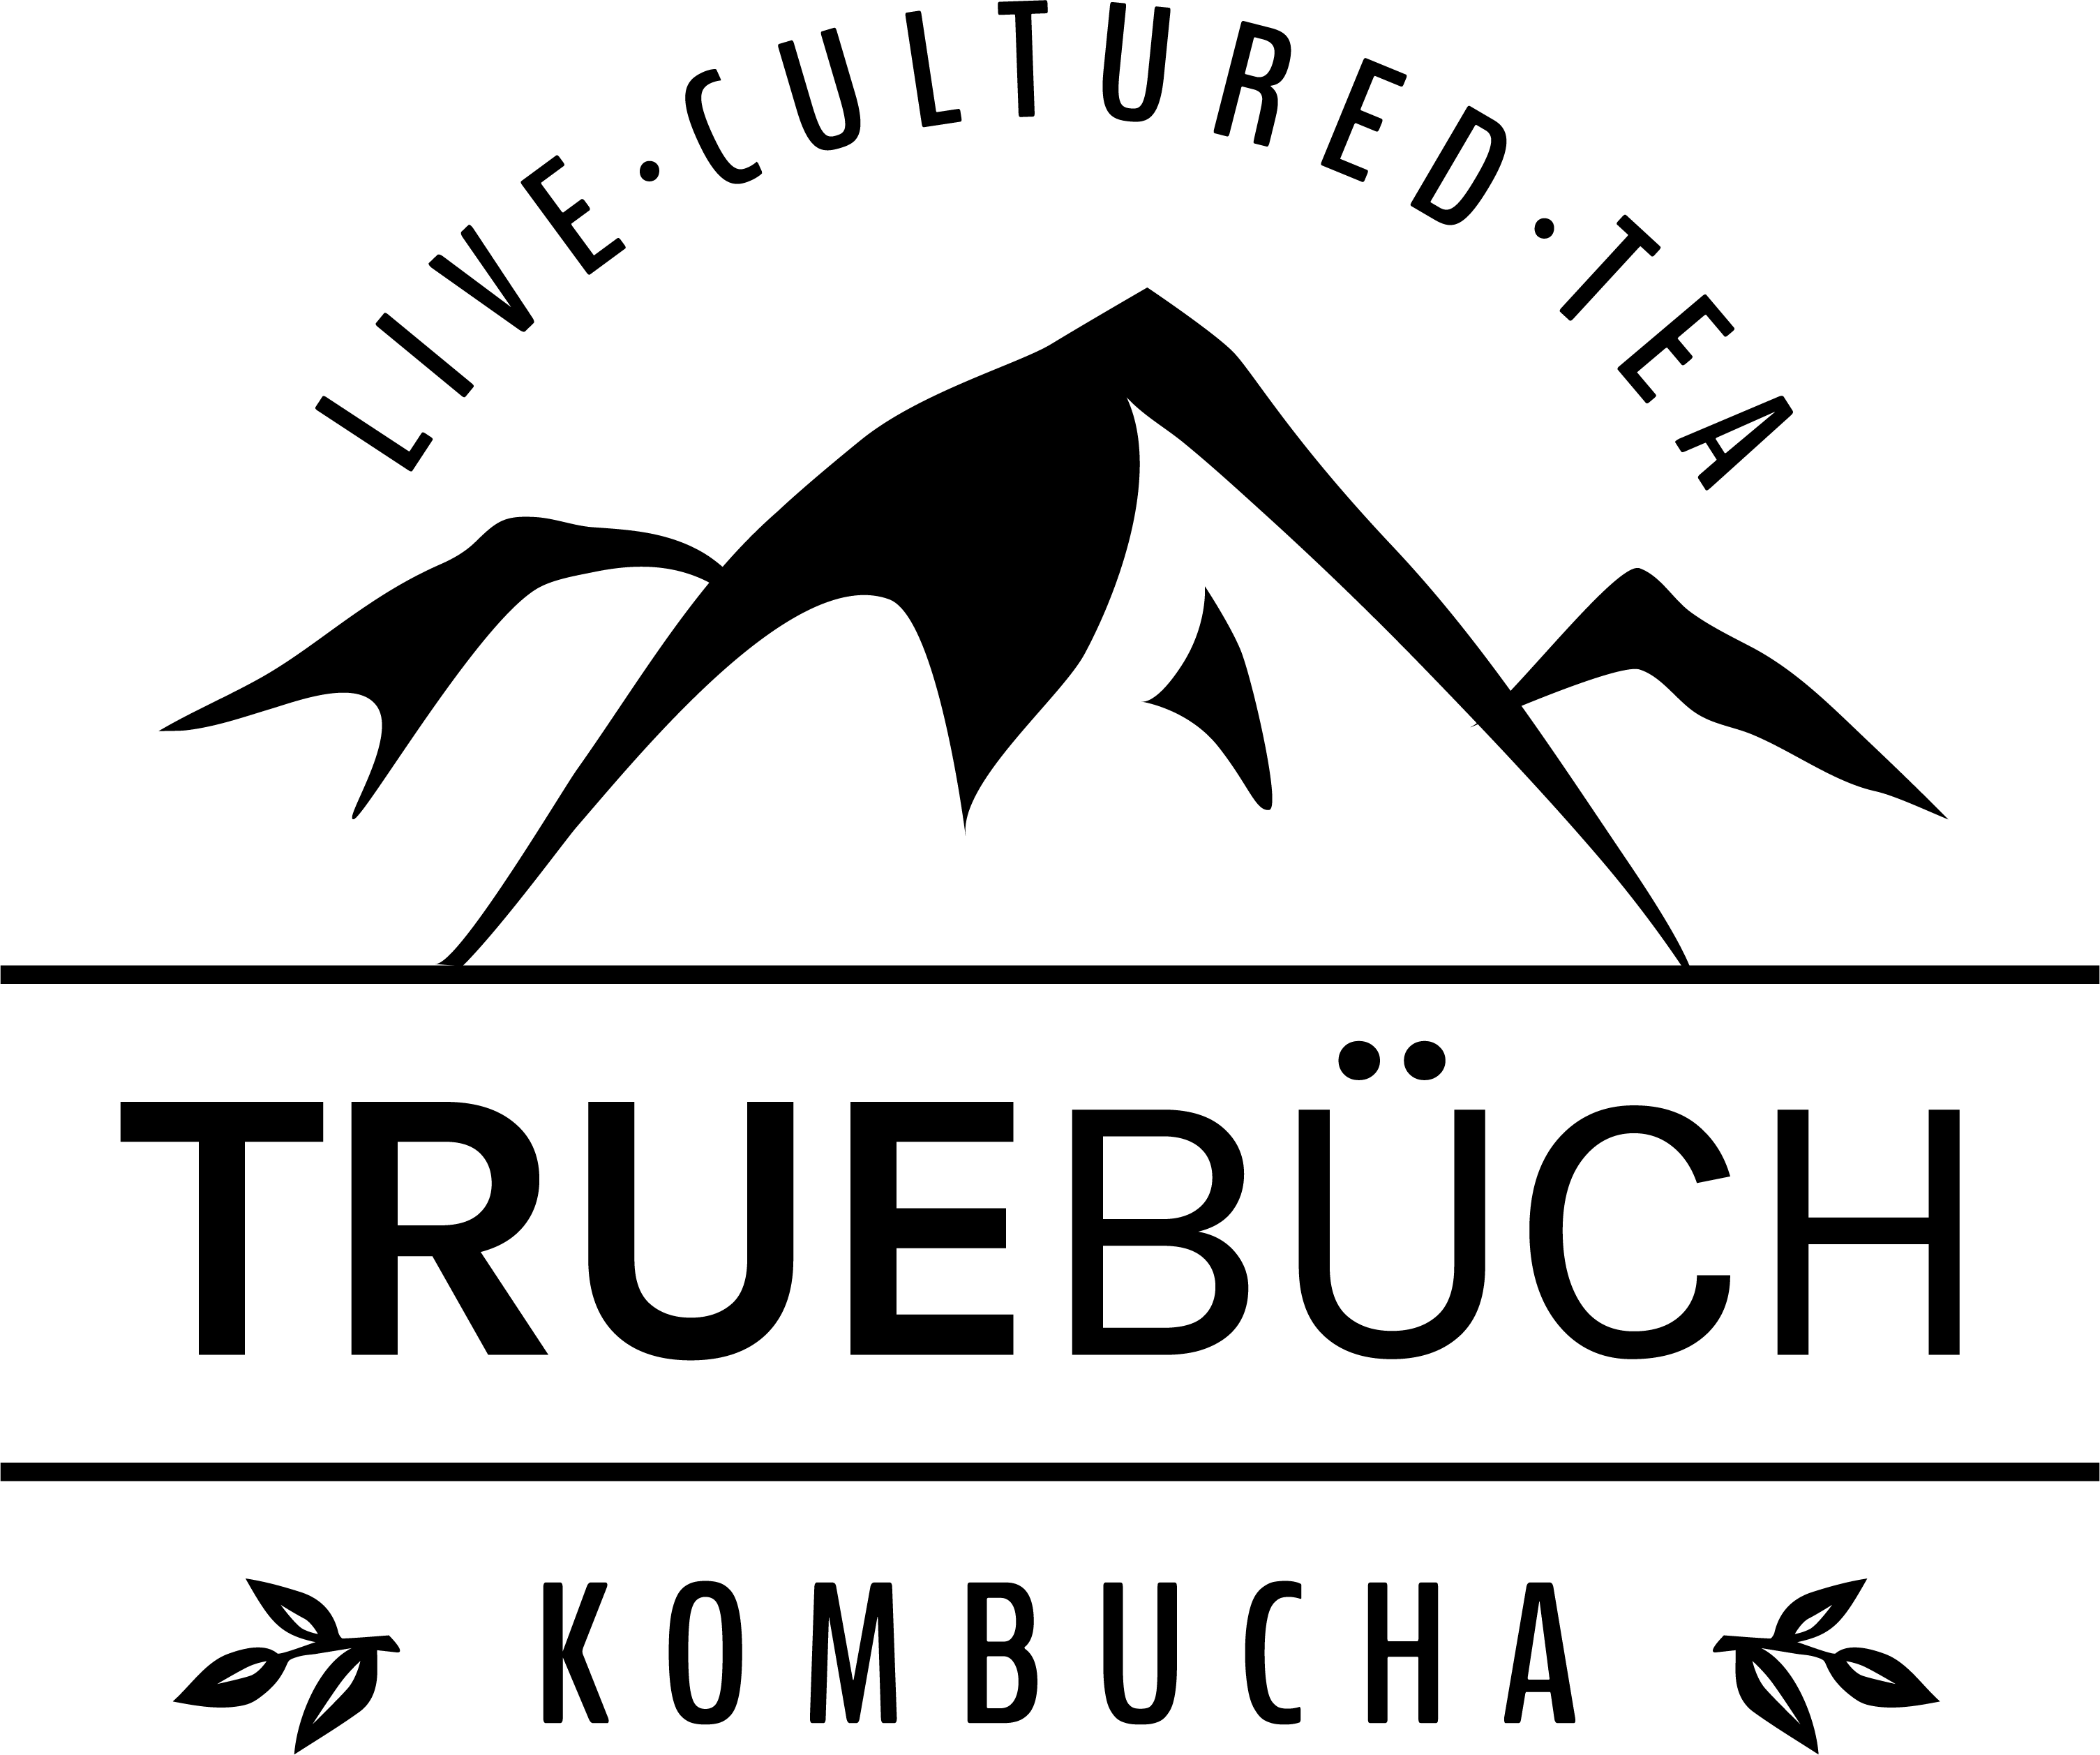 truebuch